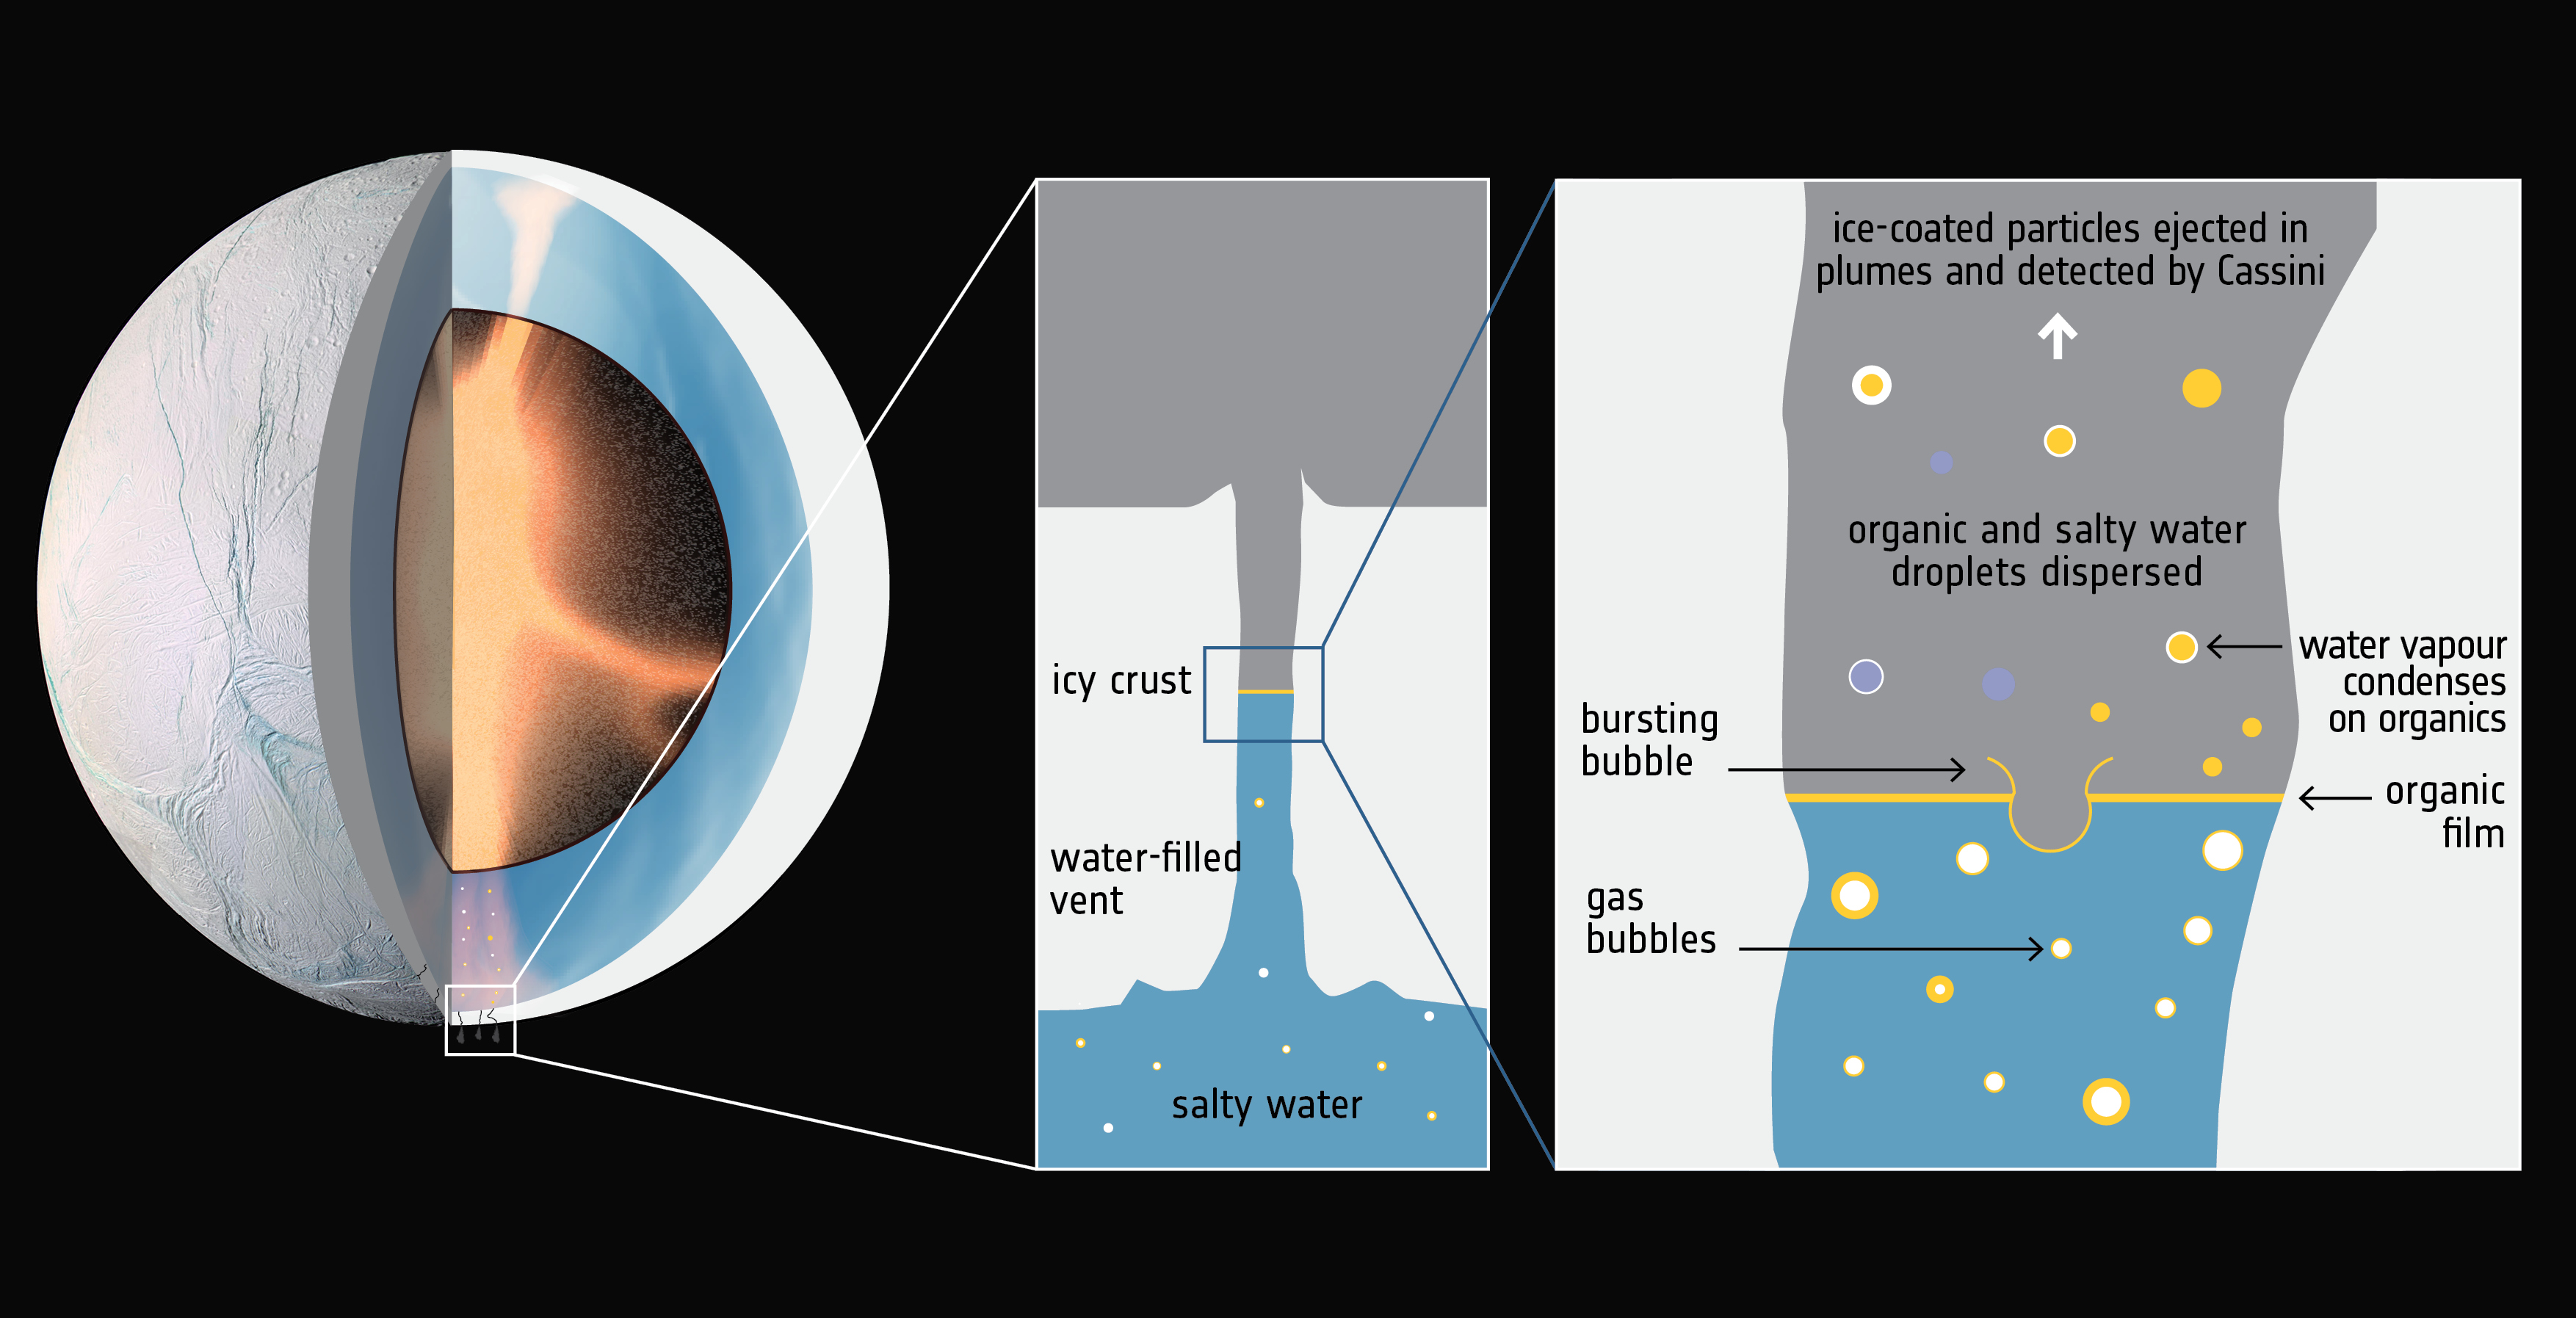 1567214300775-Cassini_Enceladus_organics_infographic_20180627.jpg